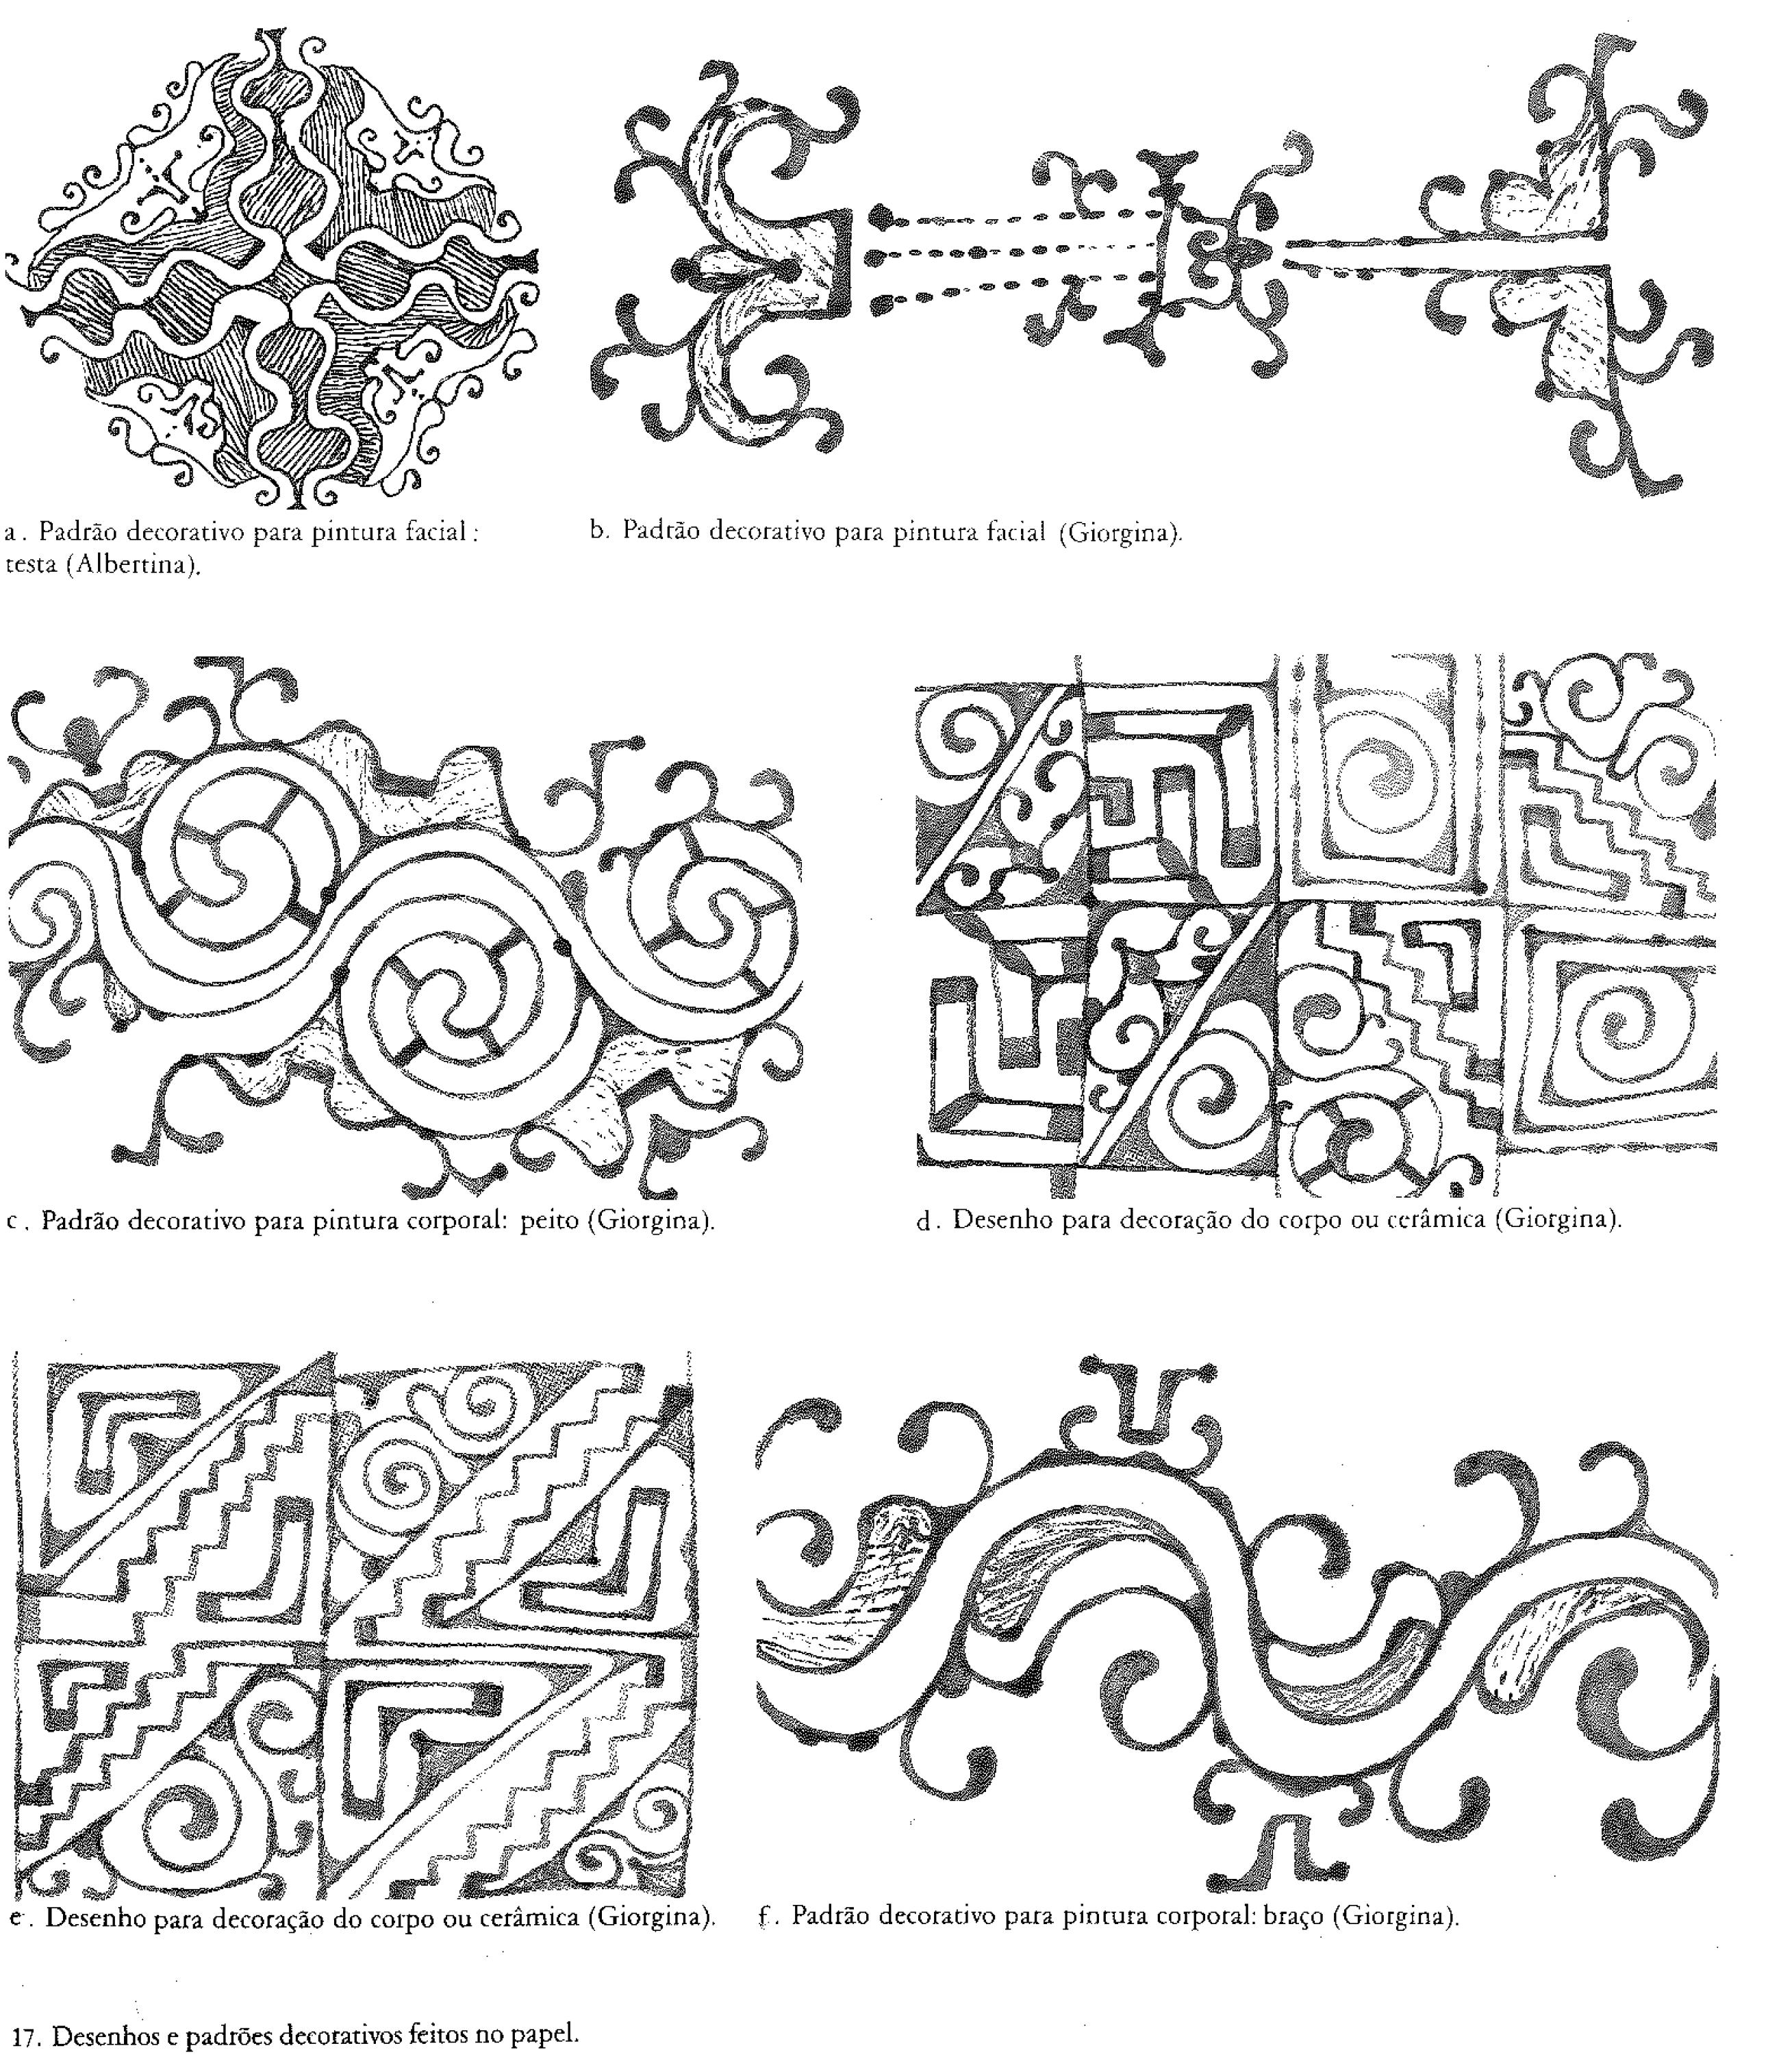 Motivos Decorativos Kadiweu In Vidal Grafismo Indigena